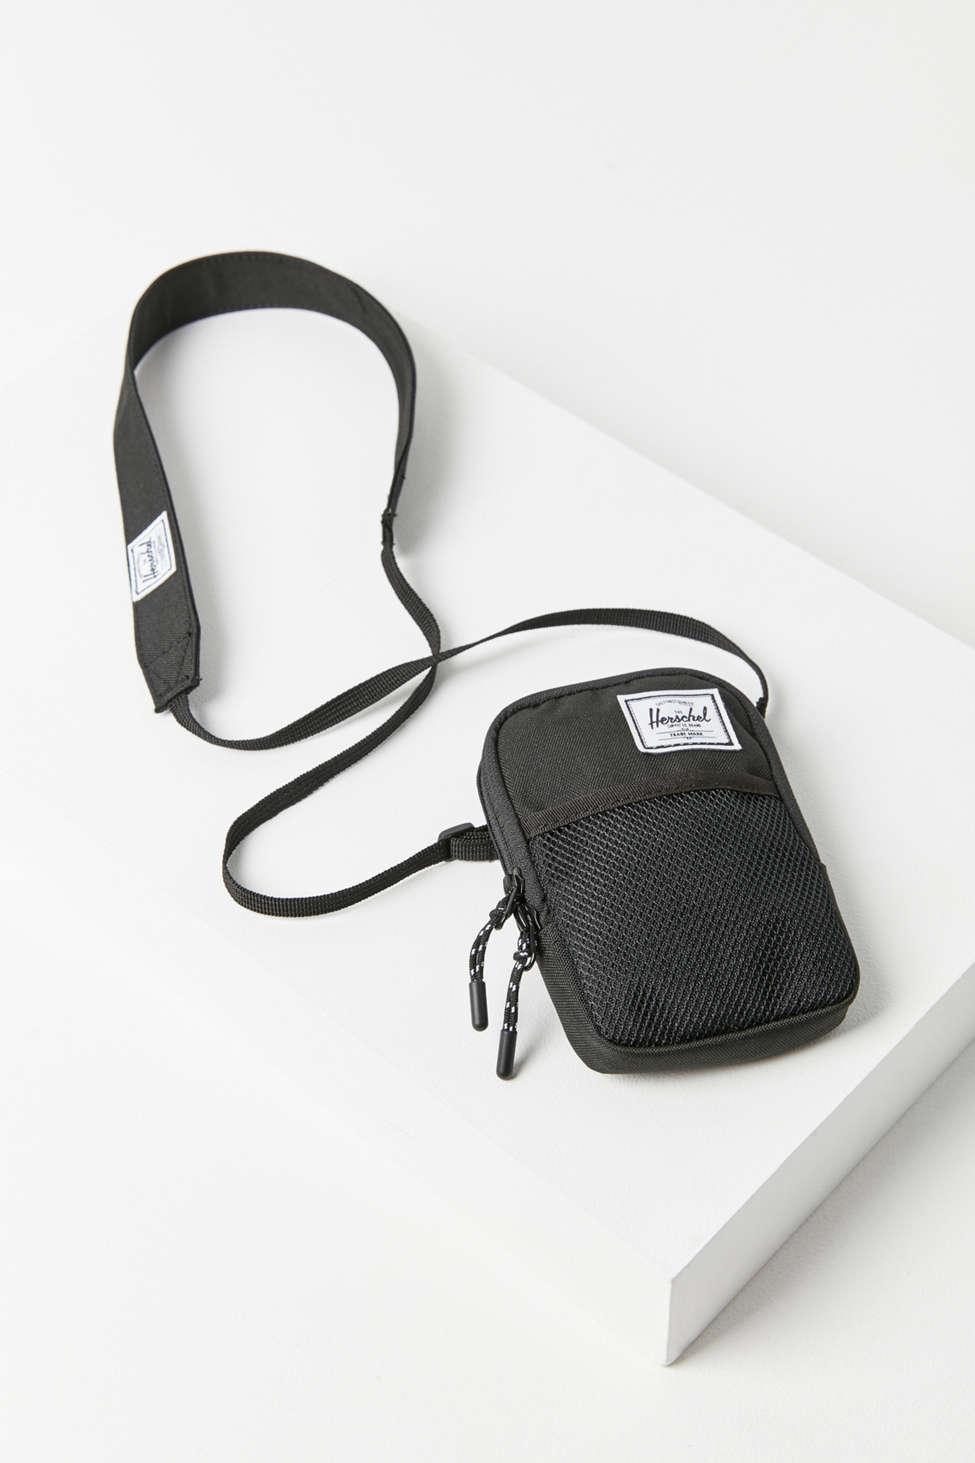 dfb140c613a Herschel Supply Co. - Black Sinclair Small Crossbody Bag - Lyst. View  fullscreen